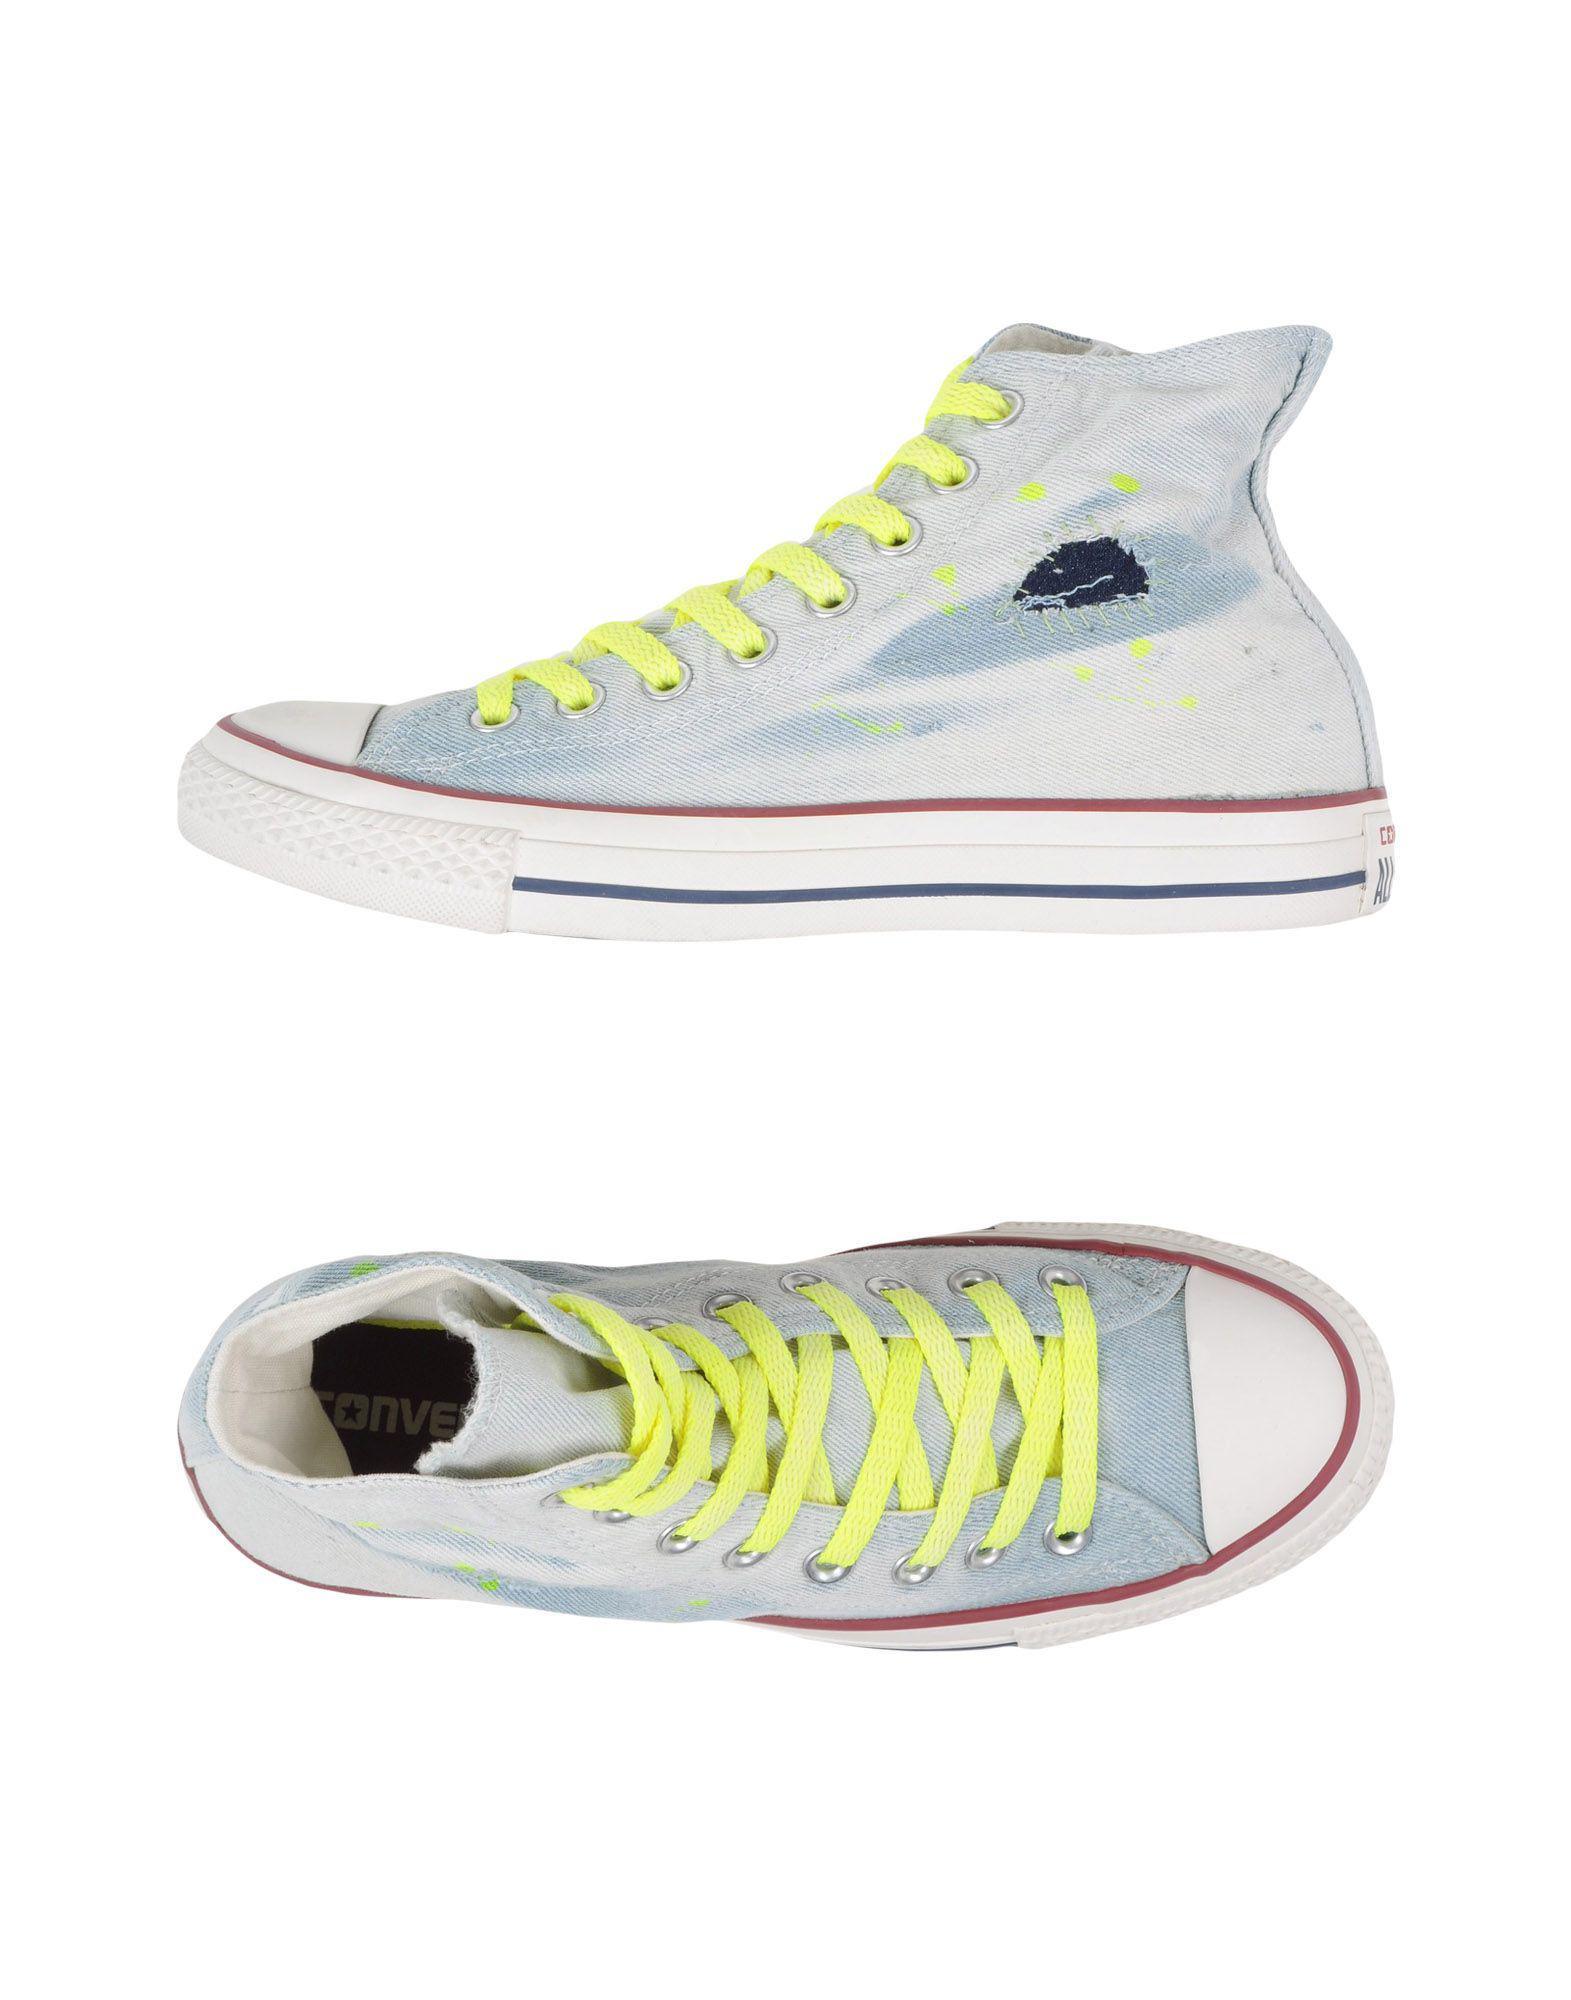 56eefc0b91fb Lyst - Converse High-tops   Sneakers in Yellow for Men